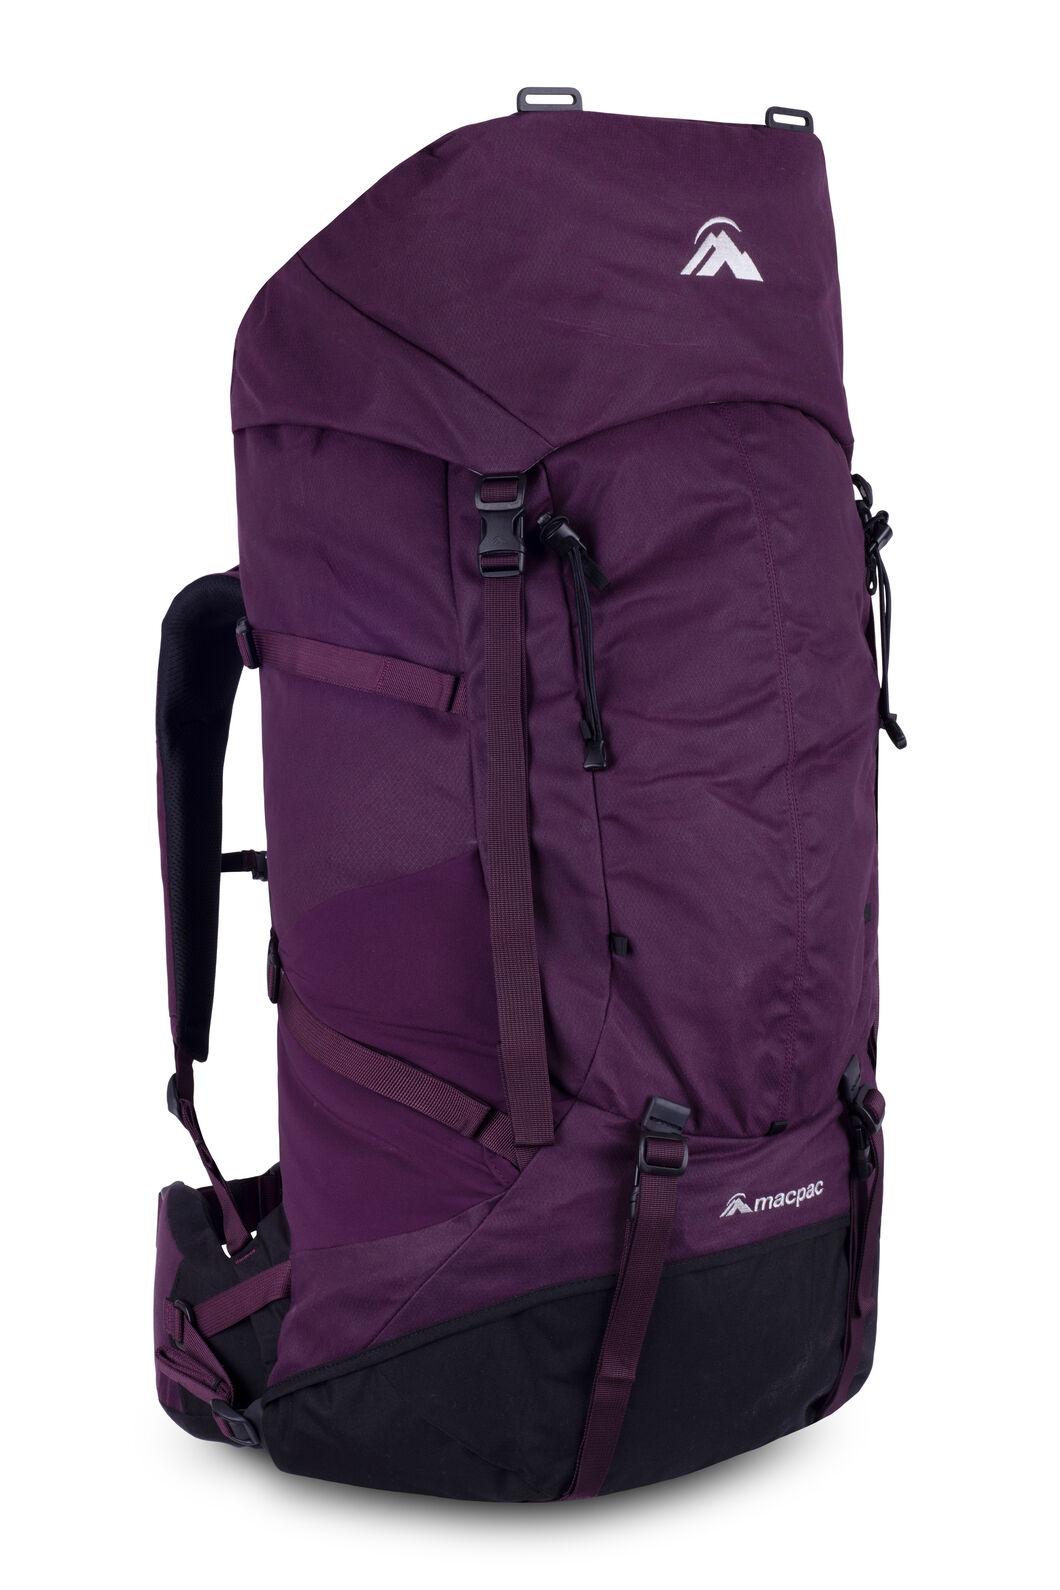 Macpac Cascade AzTec® 65L Hiking Backpack, Potent Purple/Black, hi-res